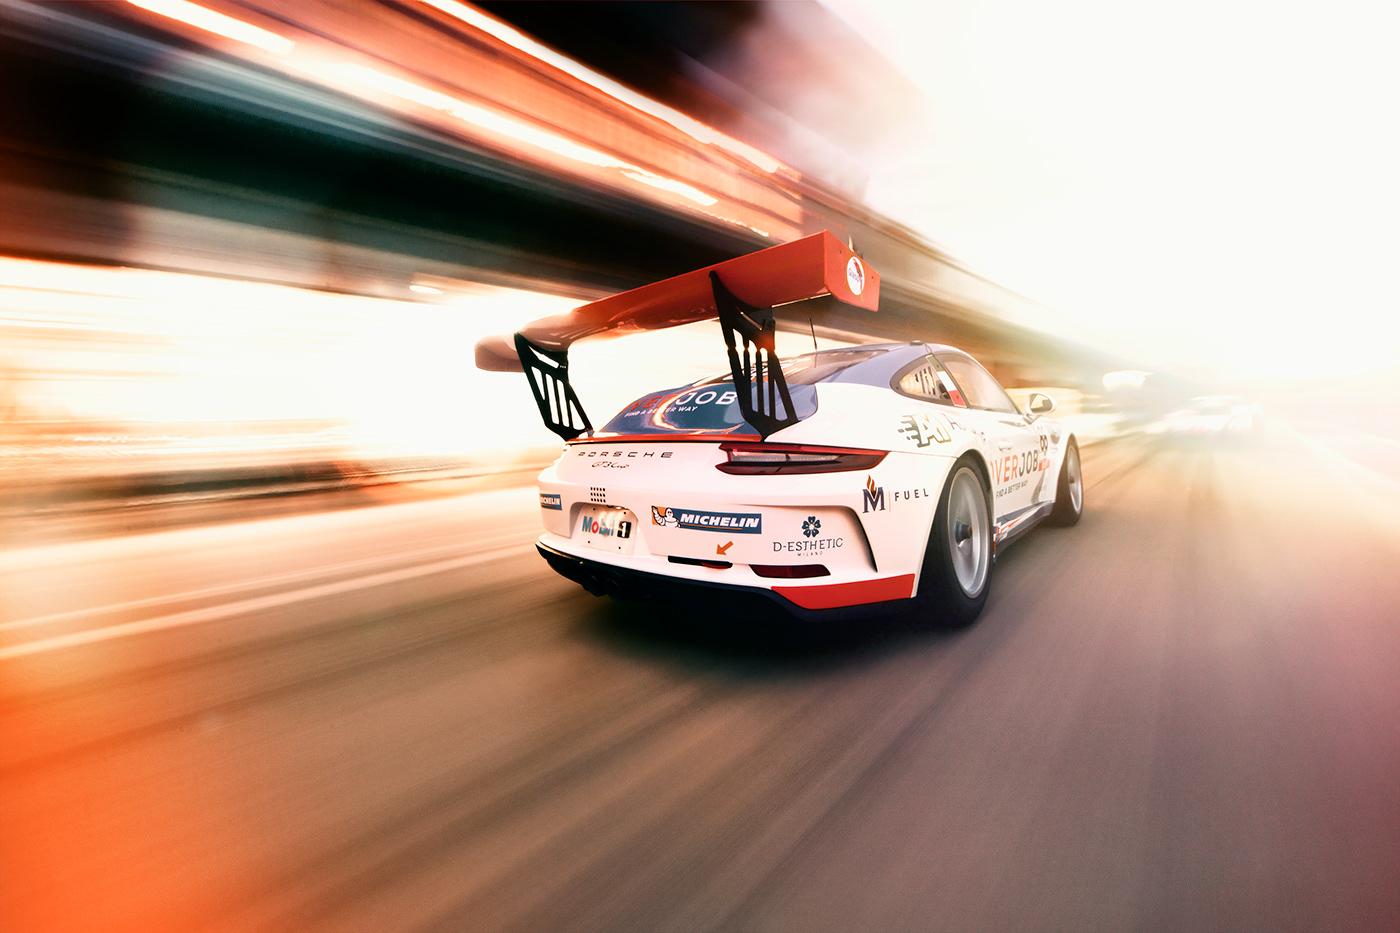 Porsche GT3 GT3RS porsche cup porsche italia automotive   race Racing race car panning